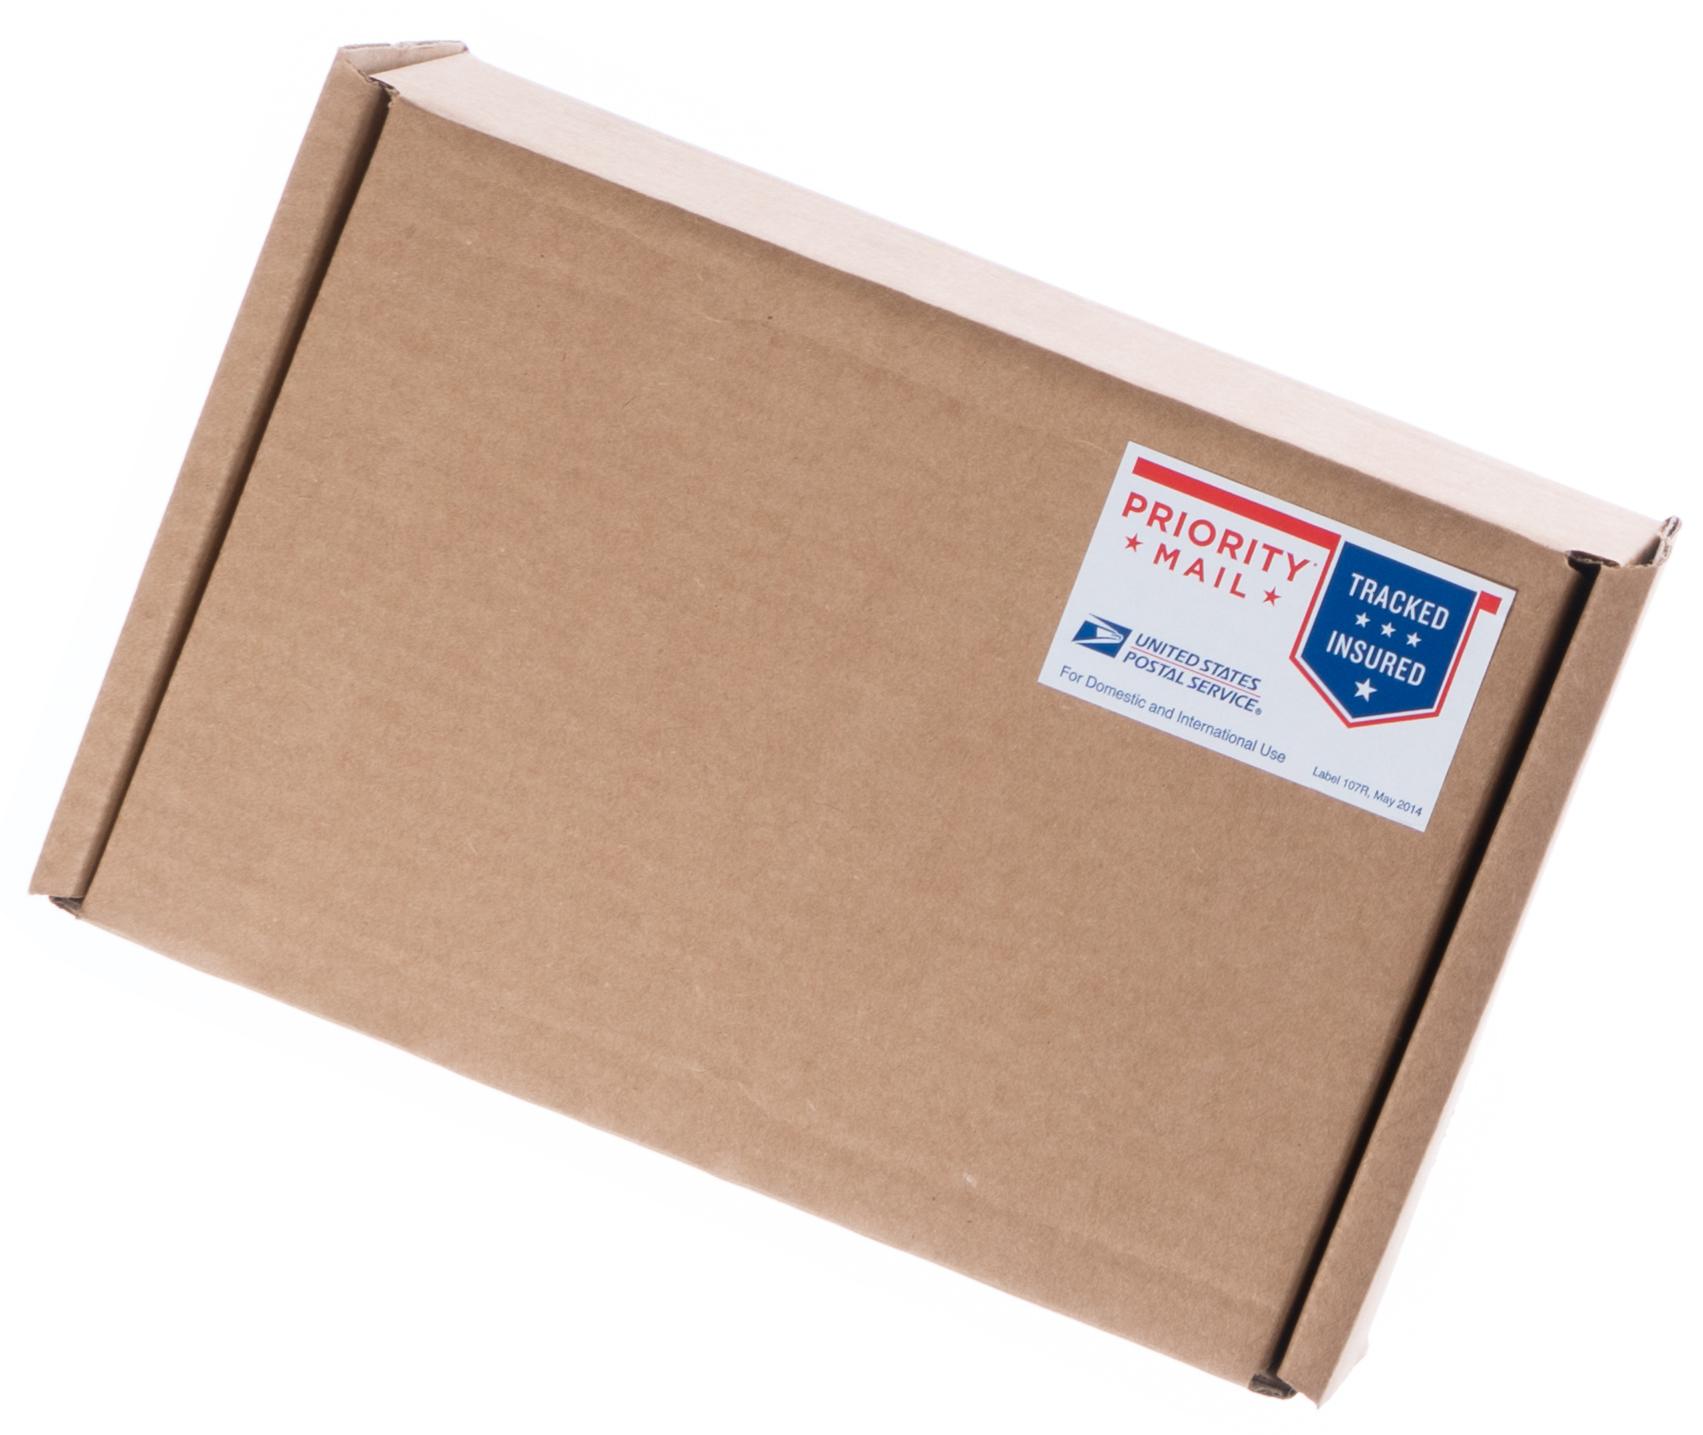 Cardboard box with Priority Mail sticker